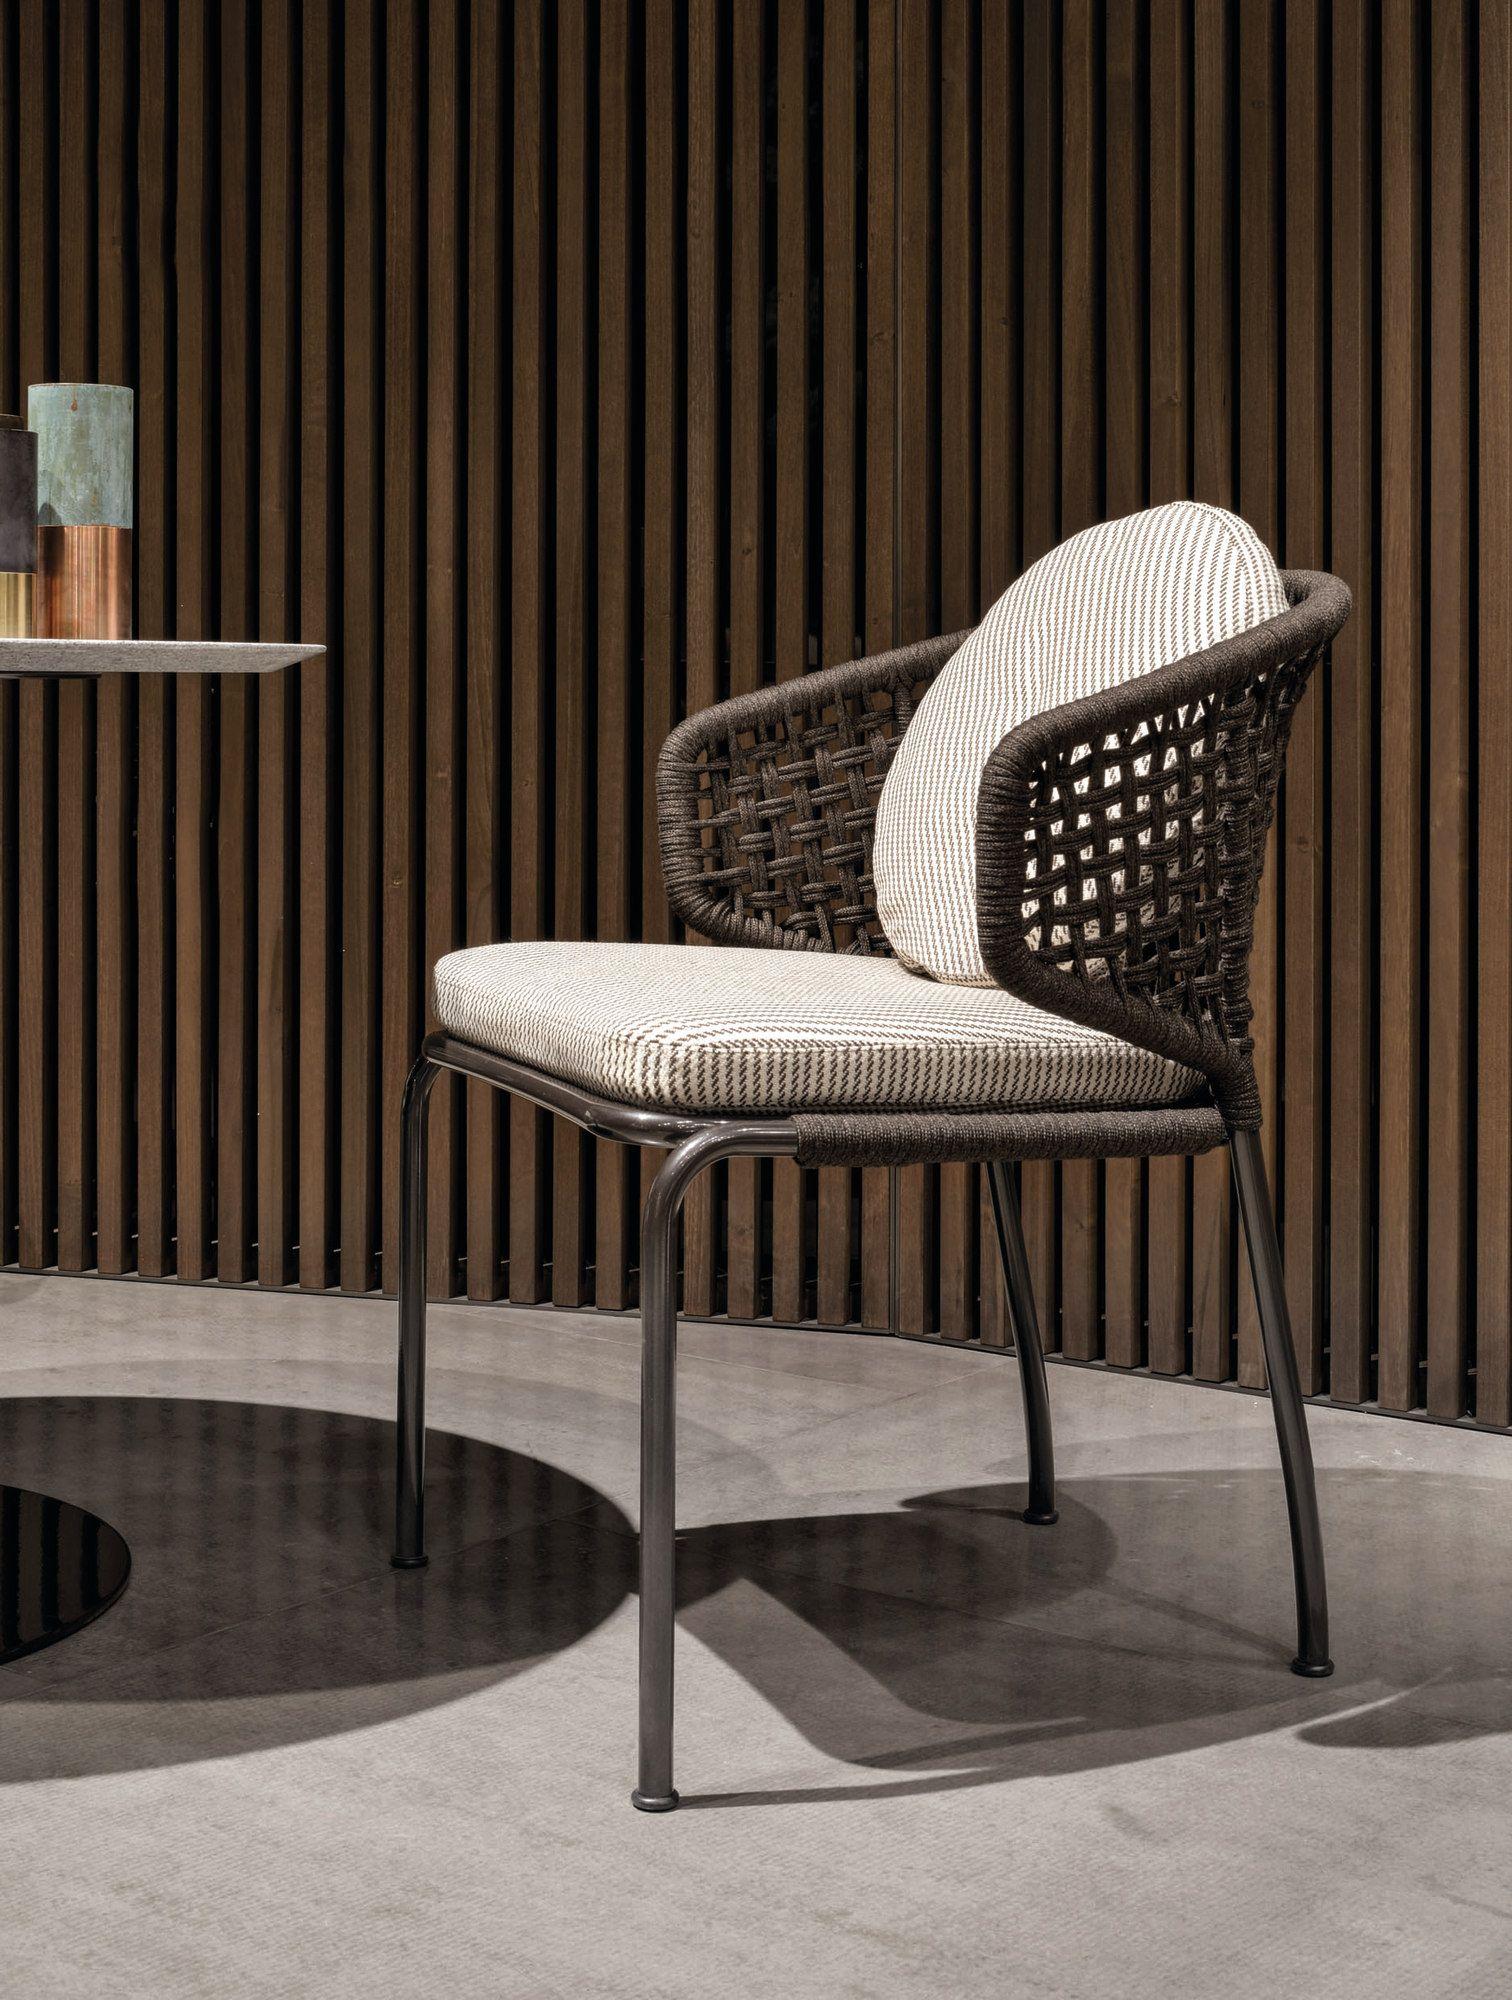 Bitta modern patio furniture by rodolfo dordoni - Aston Cord Outdoor Chair By Minotti Design Rodolfo Dordoni